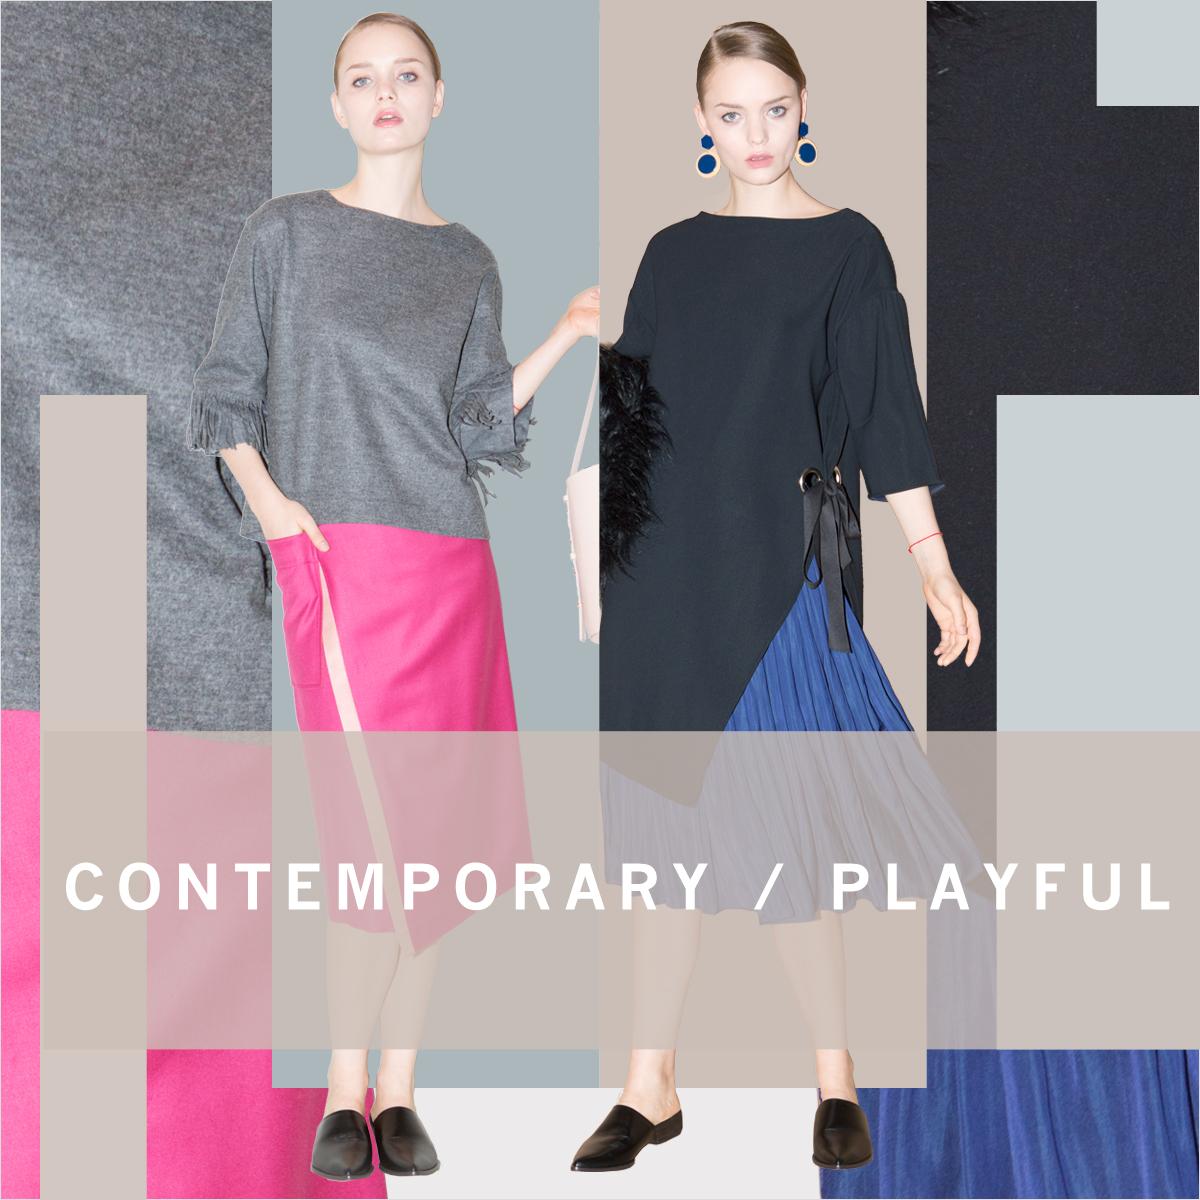 CONTEMPIRARY / PLAYFUL